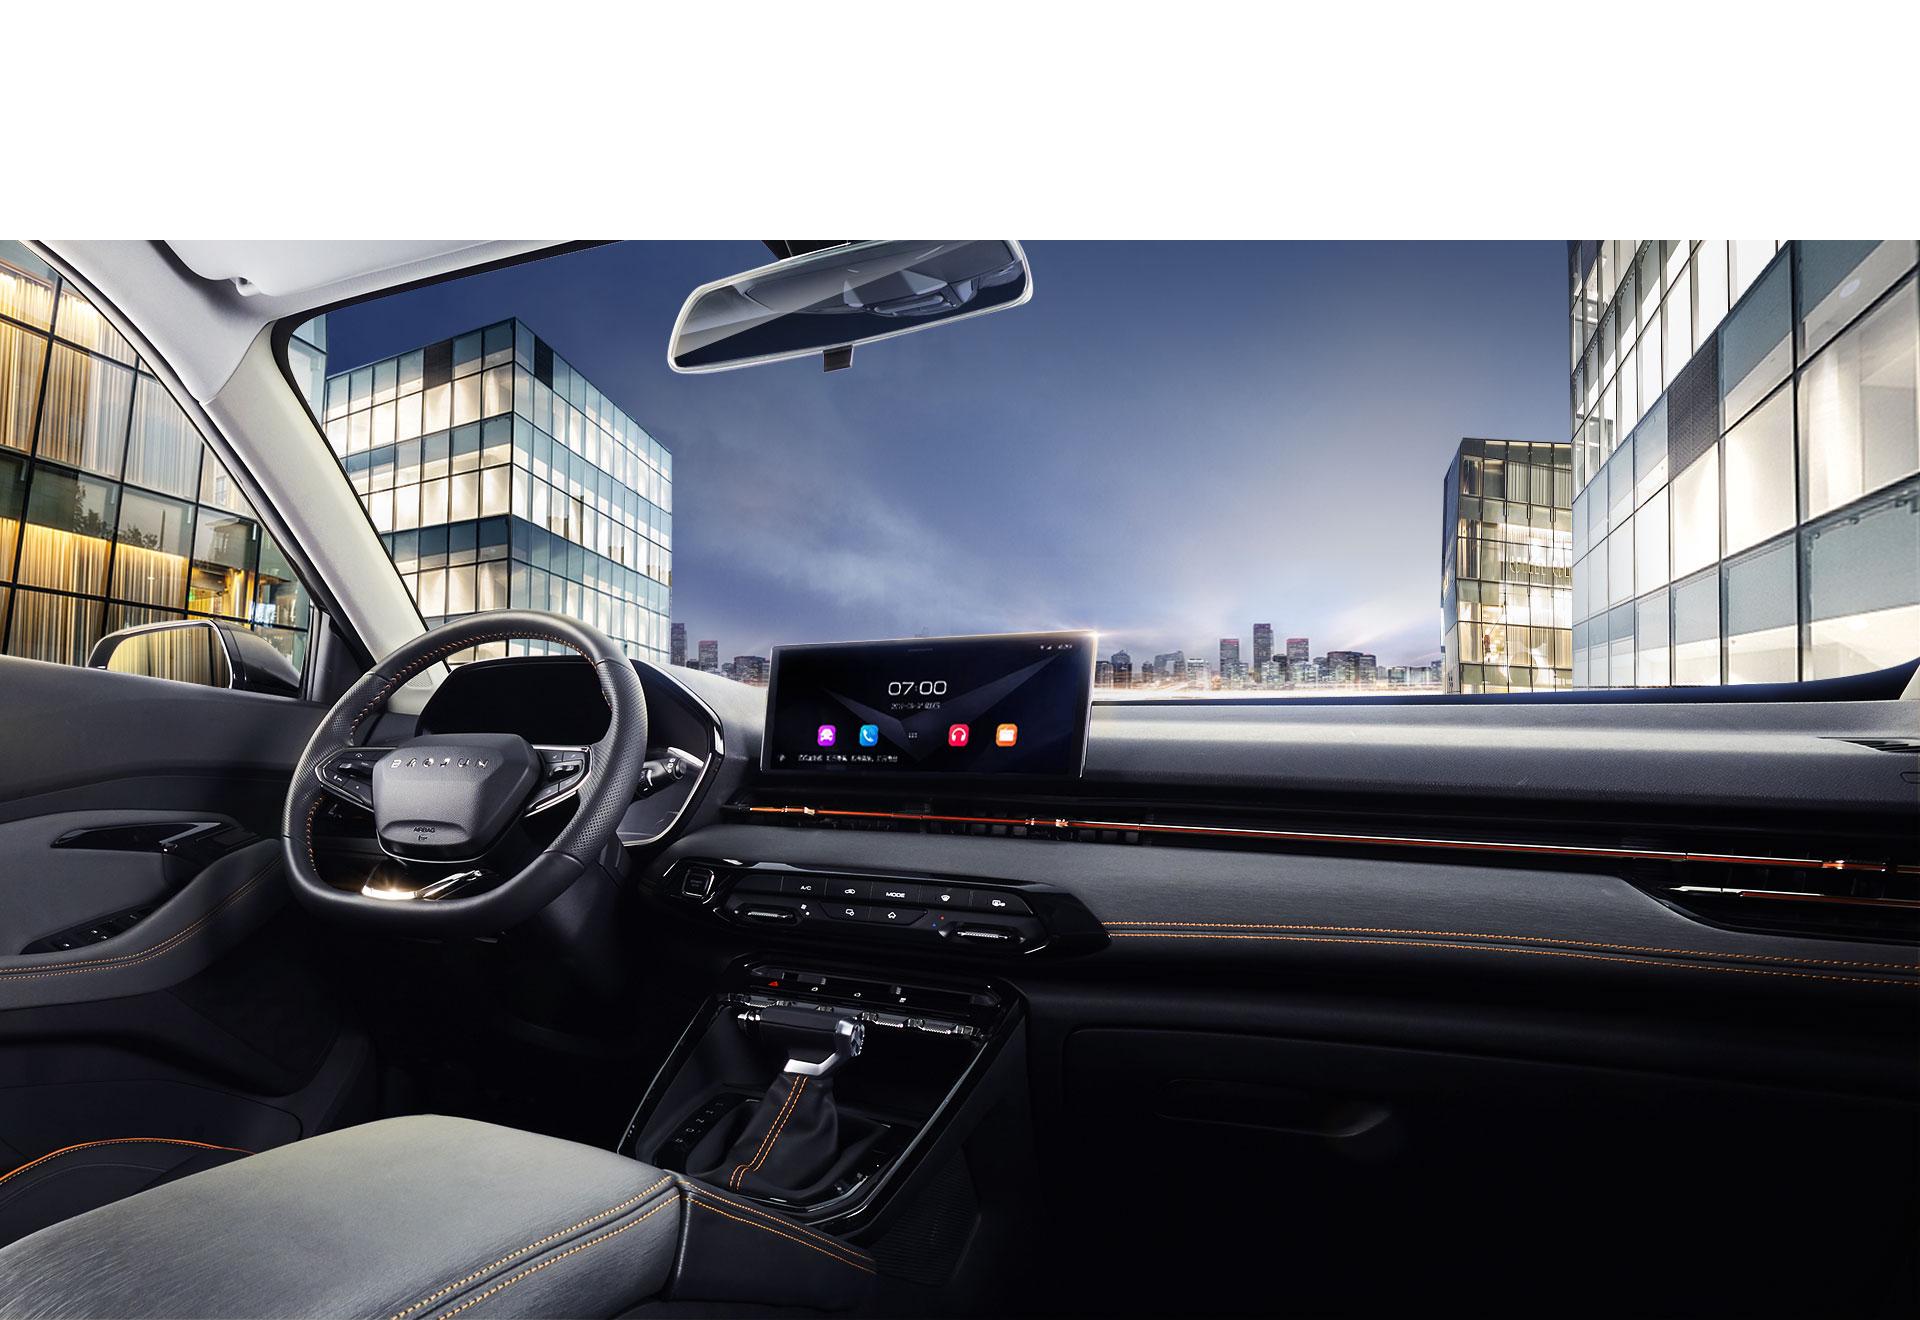 新寶駿RS-3,寶駿RS-3,寶駿RS3,圖片,智(zhi)能SUV,空間設計